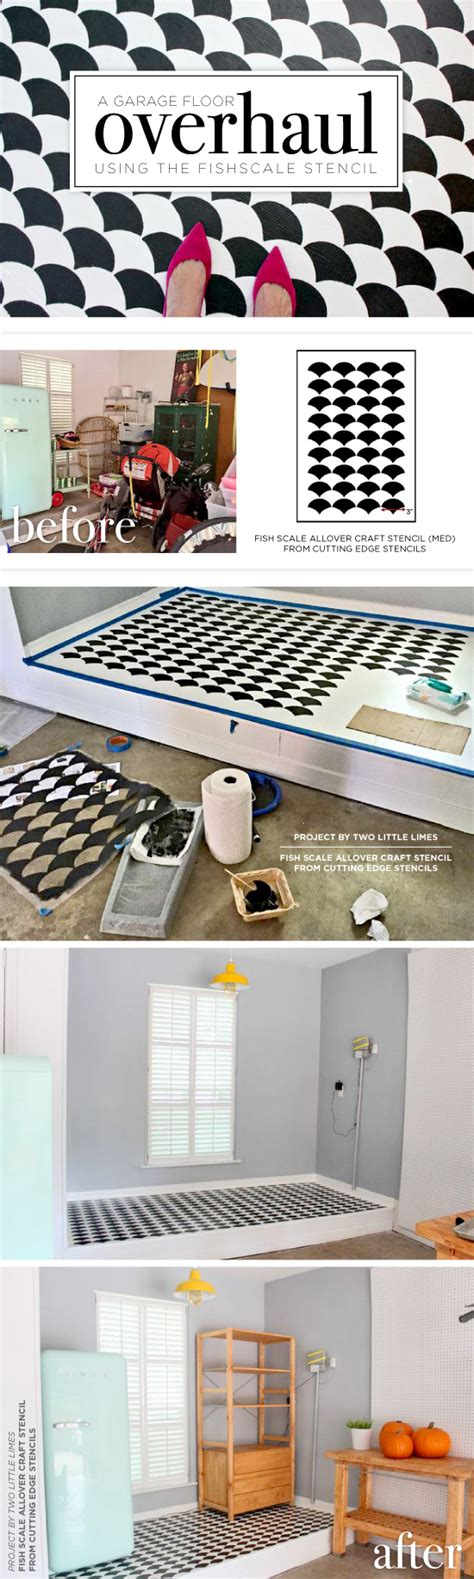 Garage Floor Stencils by A Garage Floor Overhaul Using The Fishscale Stencil